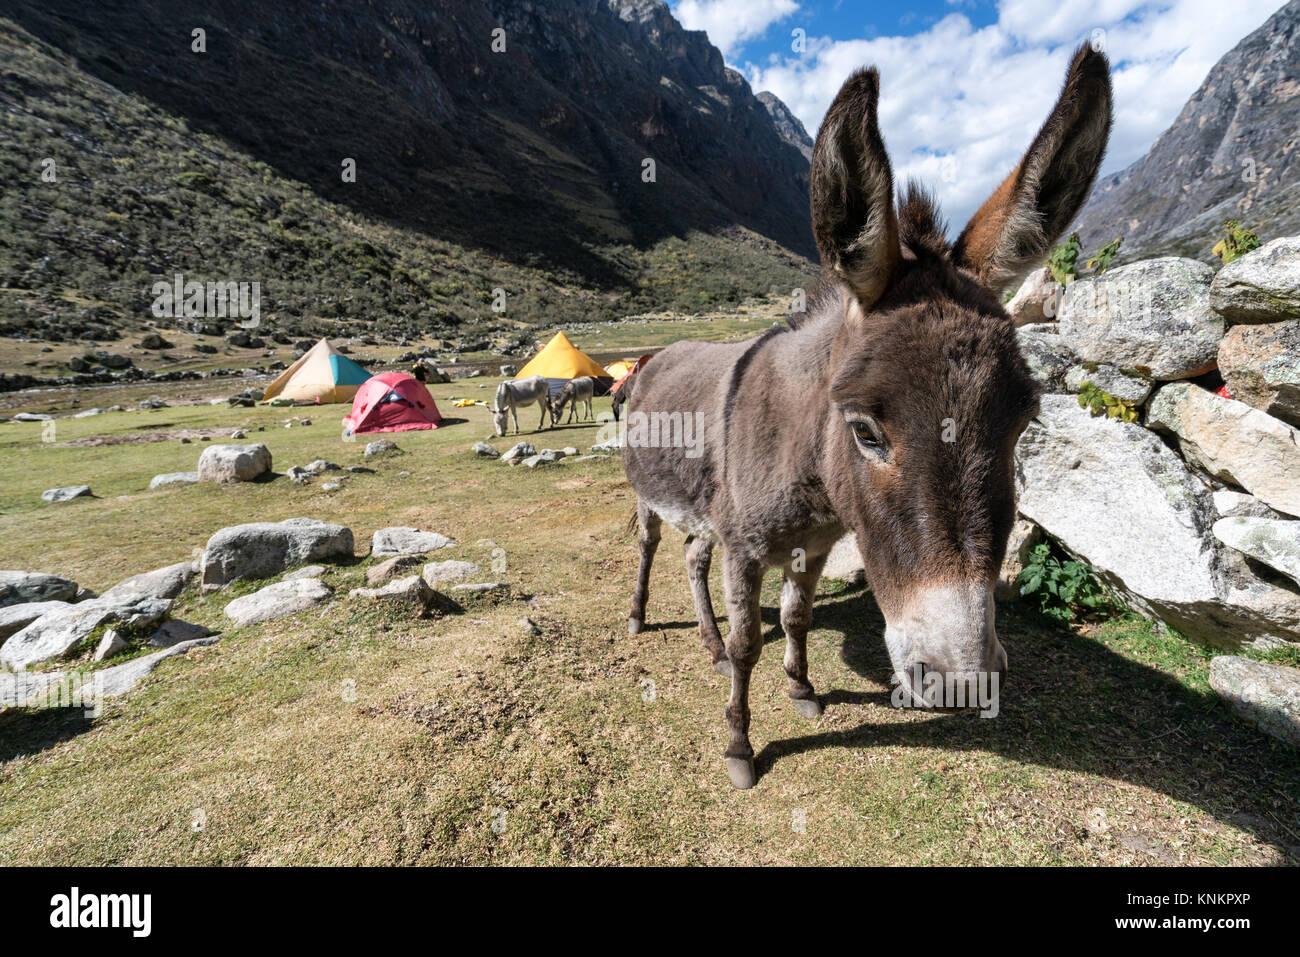 Curiour âne à Santa Cruz valley, Cordillère blanche, Pérou Photo Stock